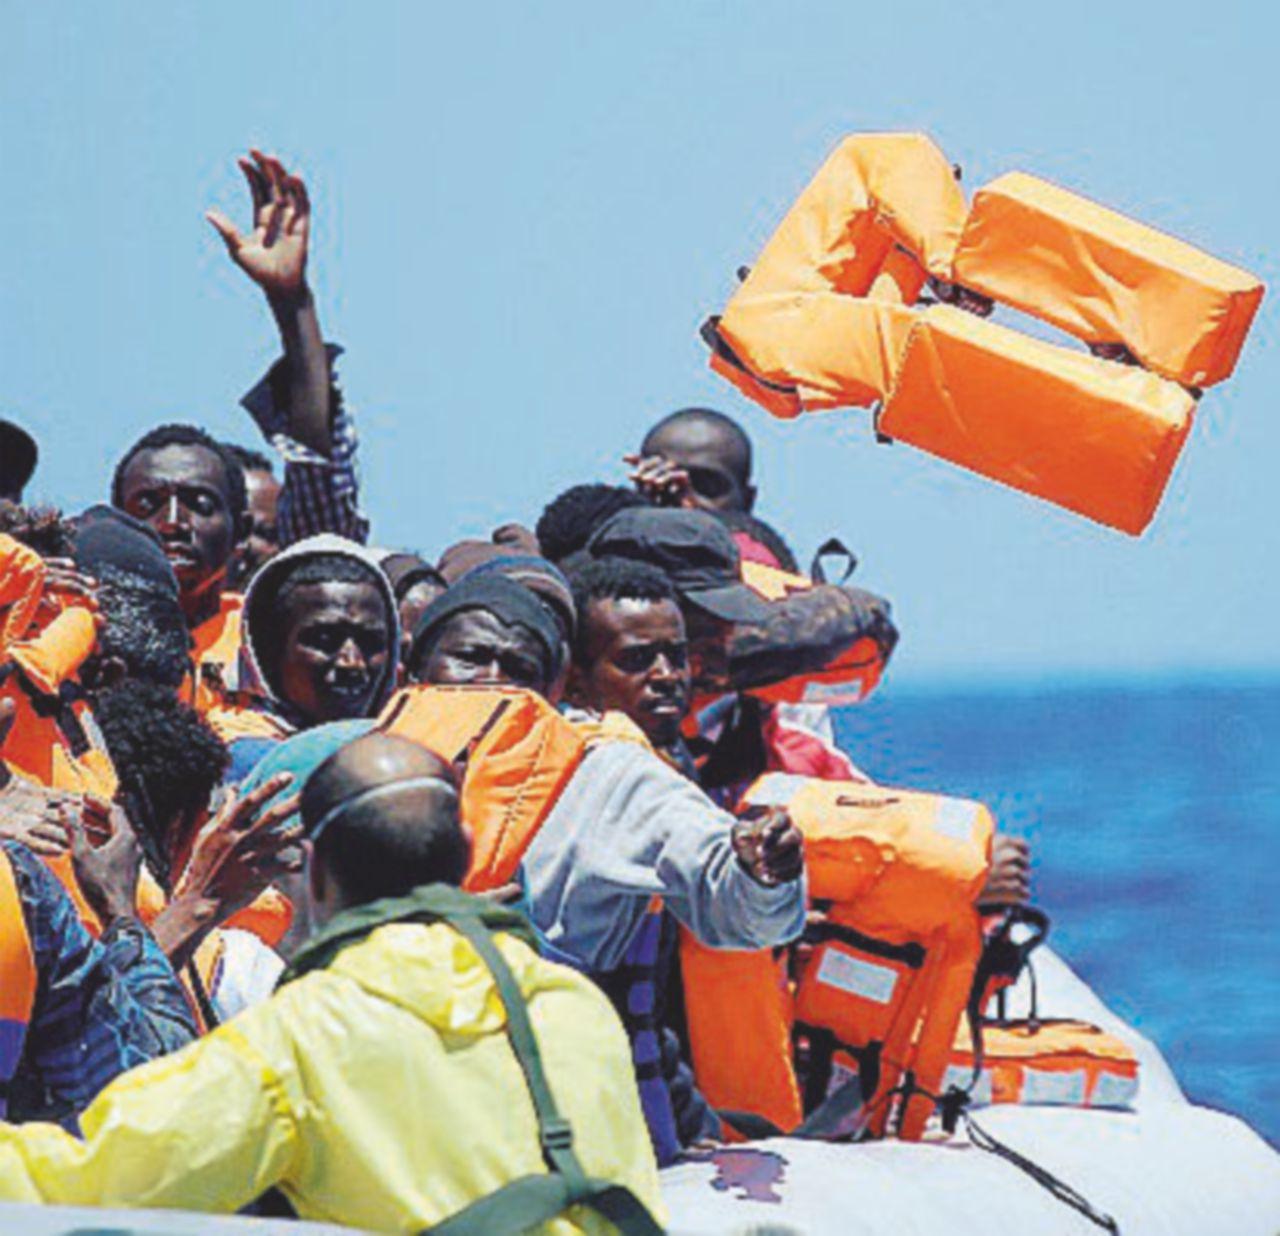 Mediterraneo, oltre 50 morti in due naufragi